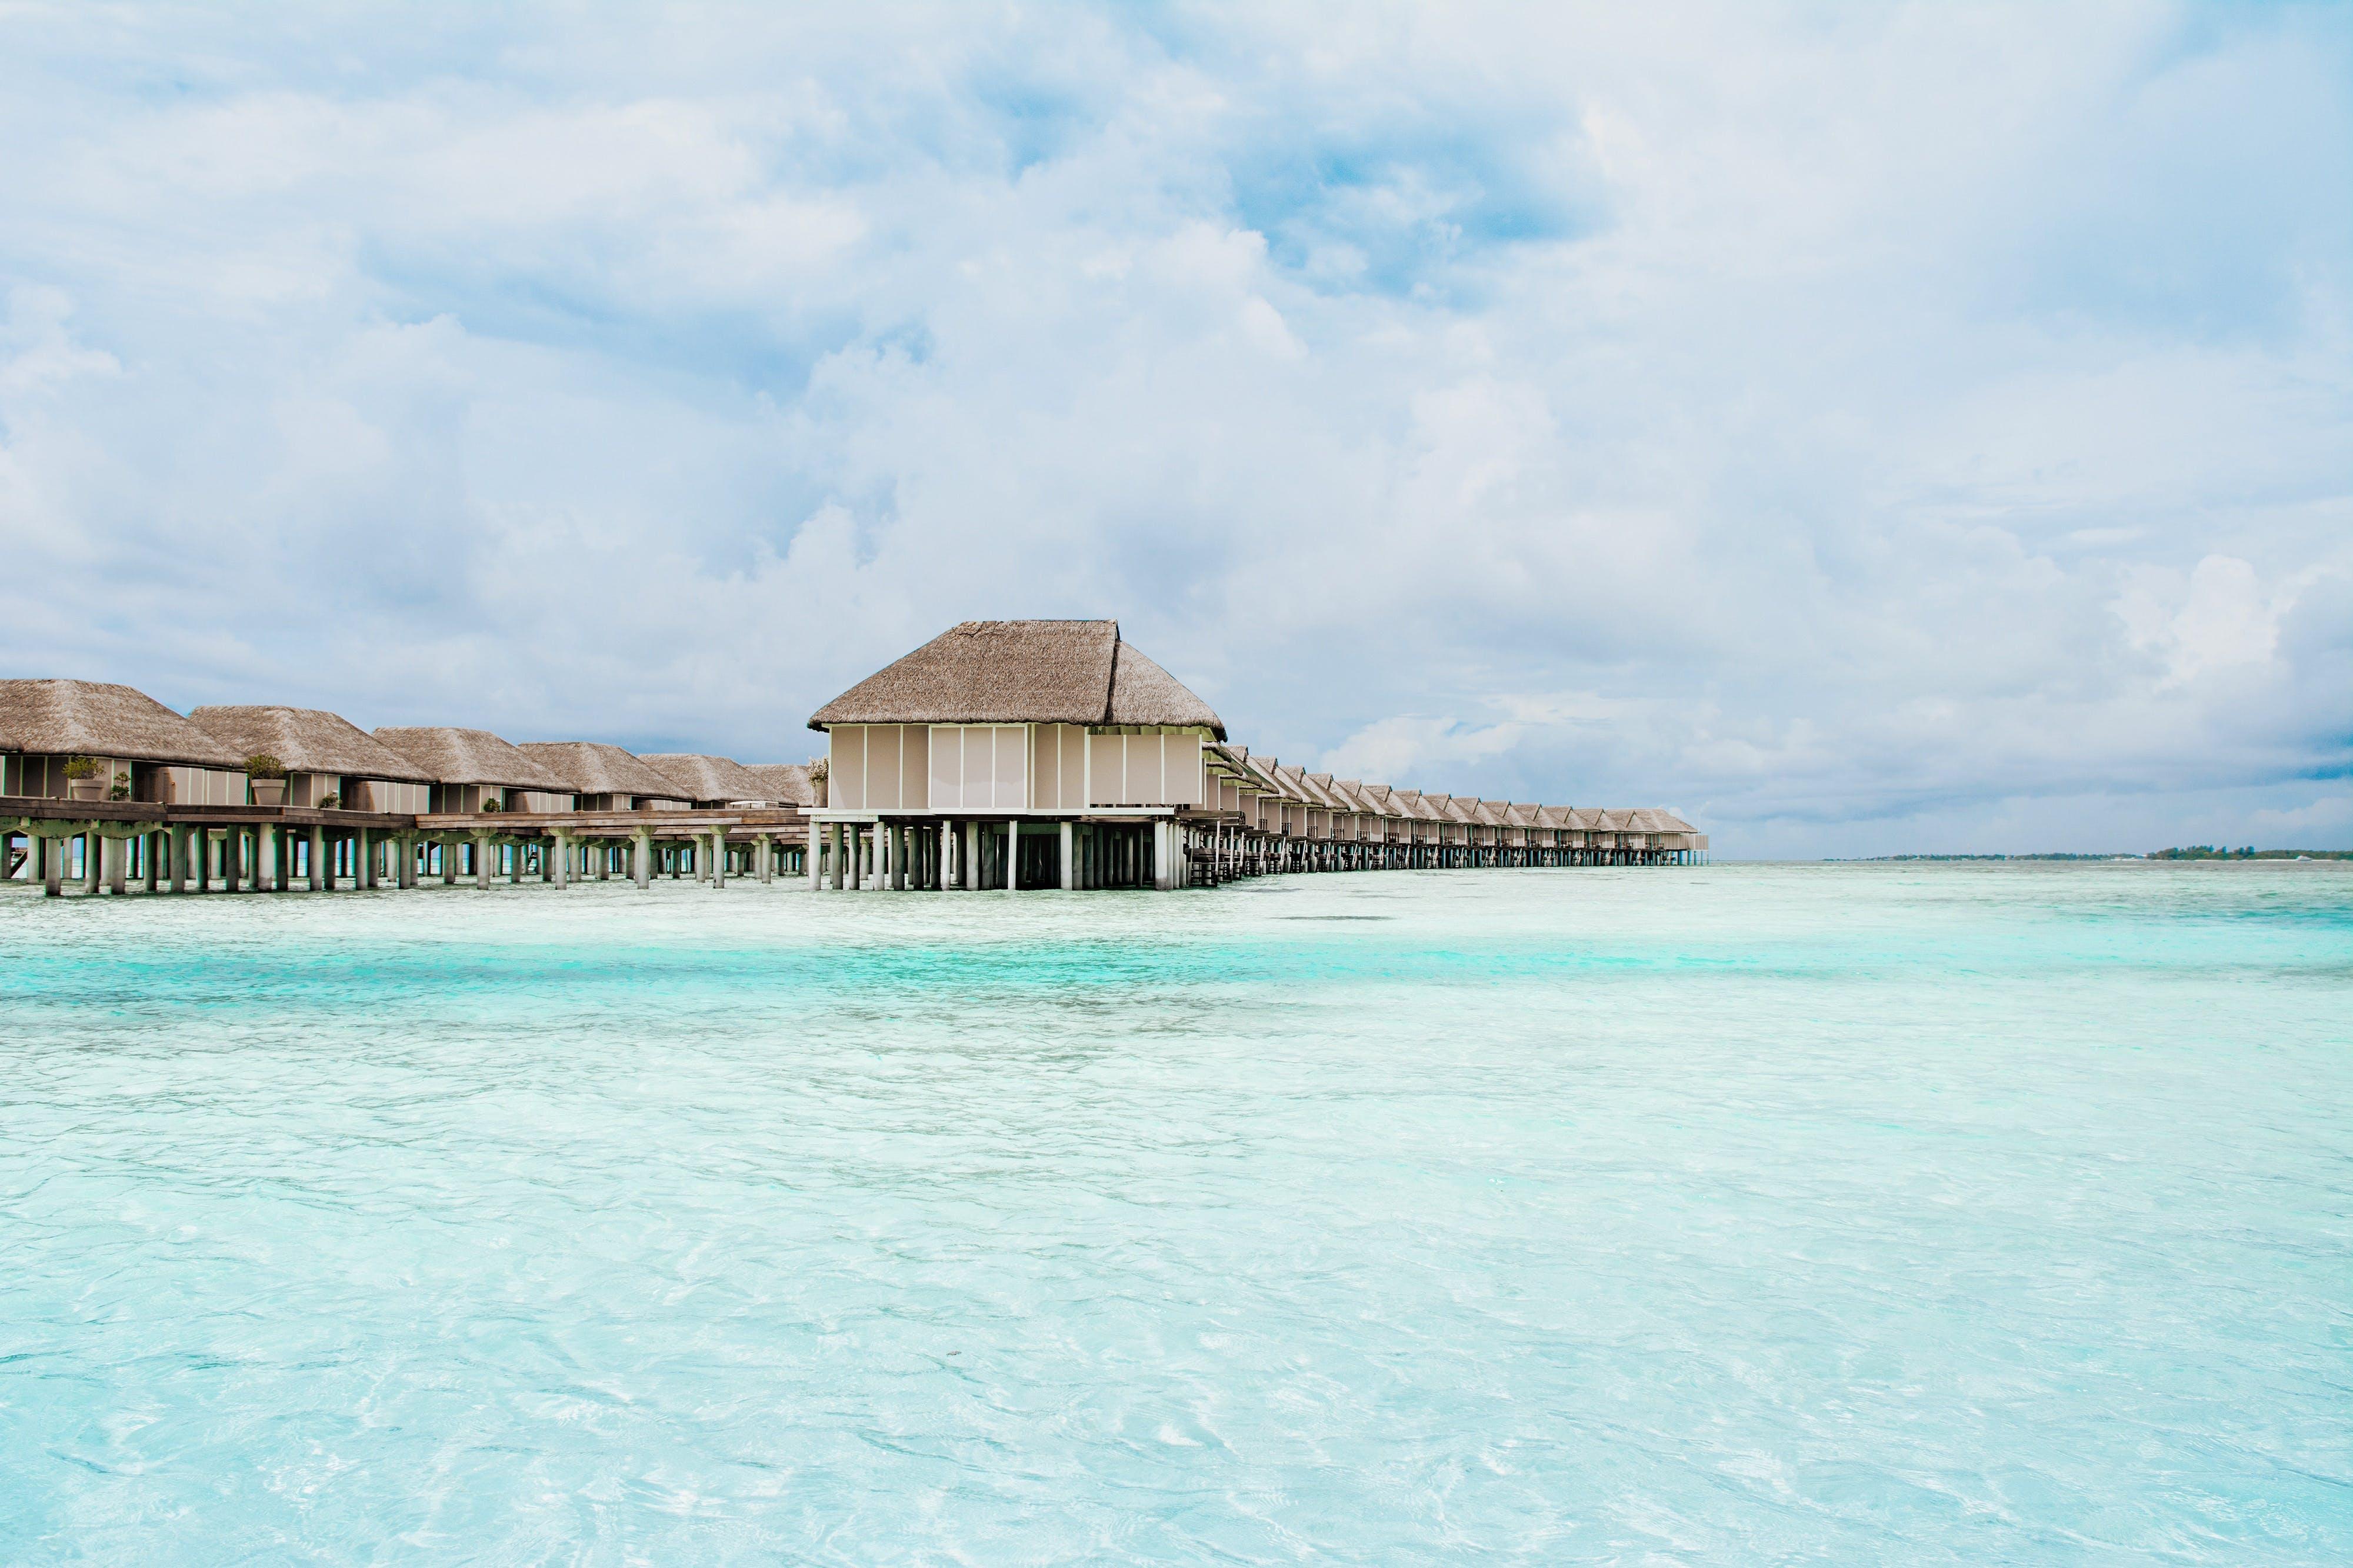 Fotos de stock gratuitas de bungalow, casas de campo, centro turístico, hotel